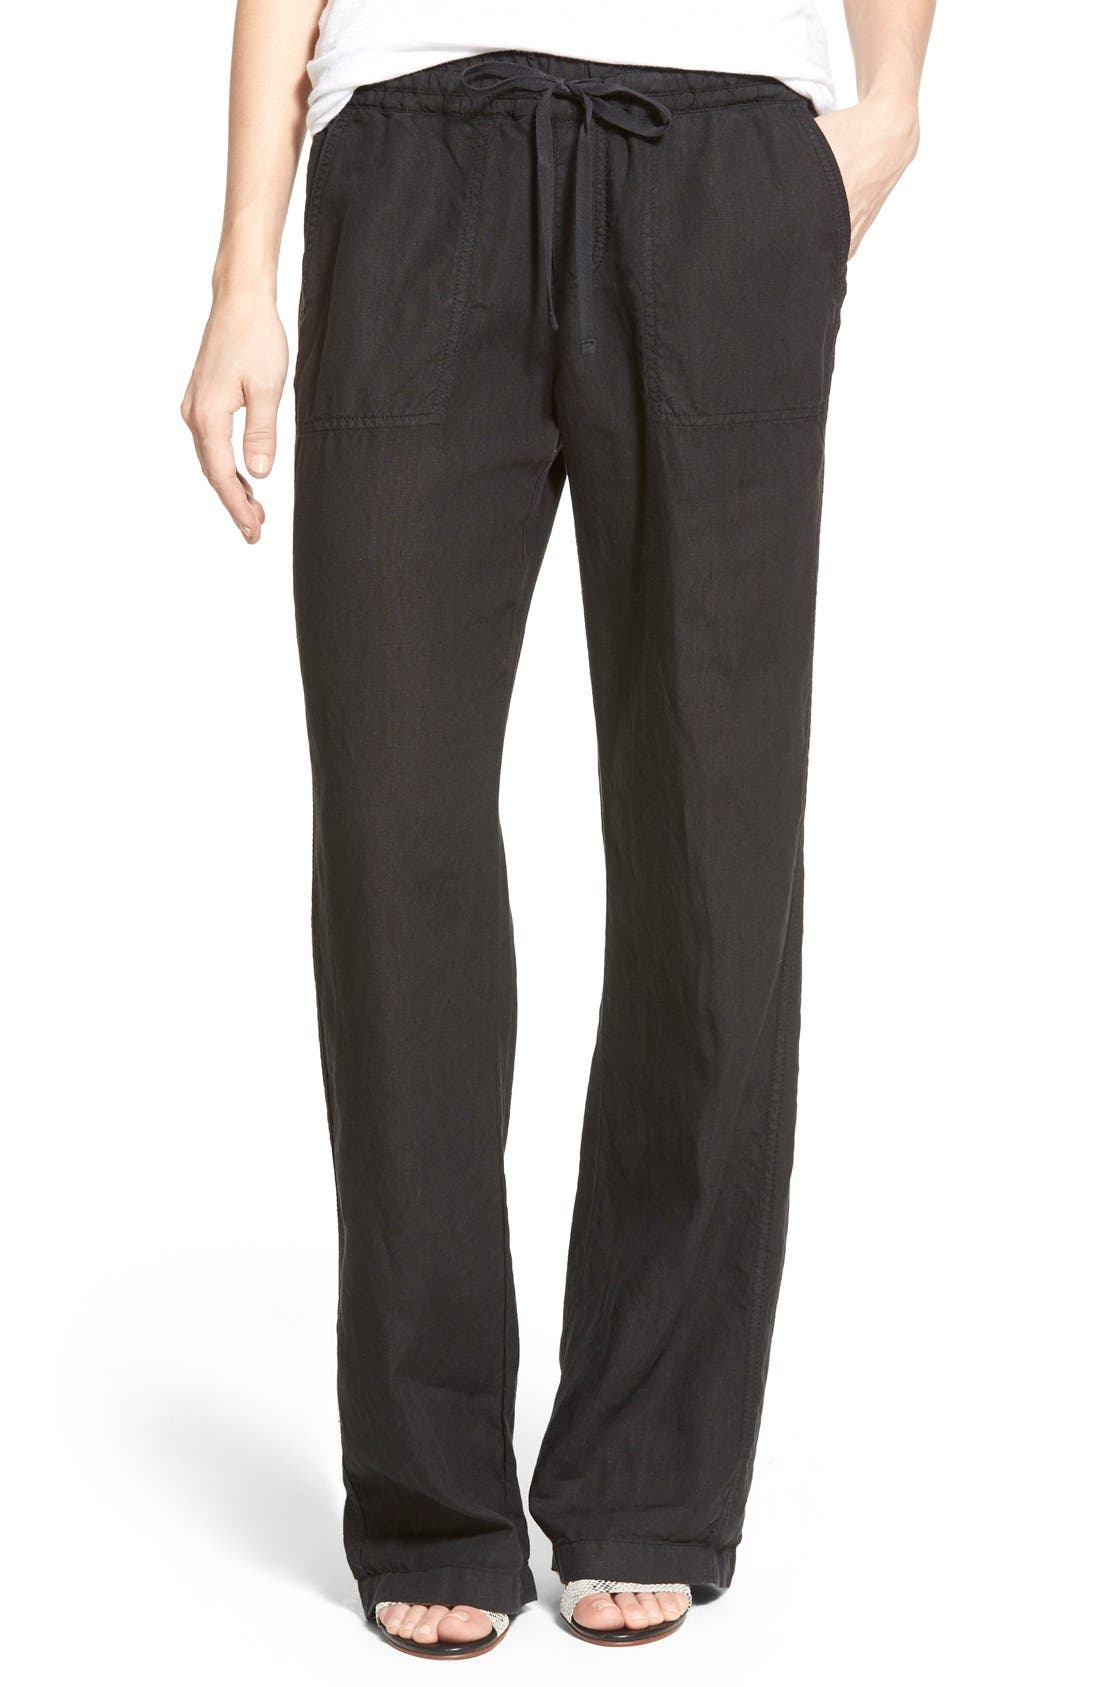 TROUSERS - 3/4-length trousers BB Jeans London pF1GWXrzjb